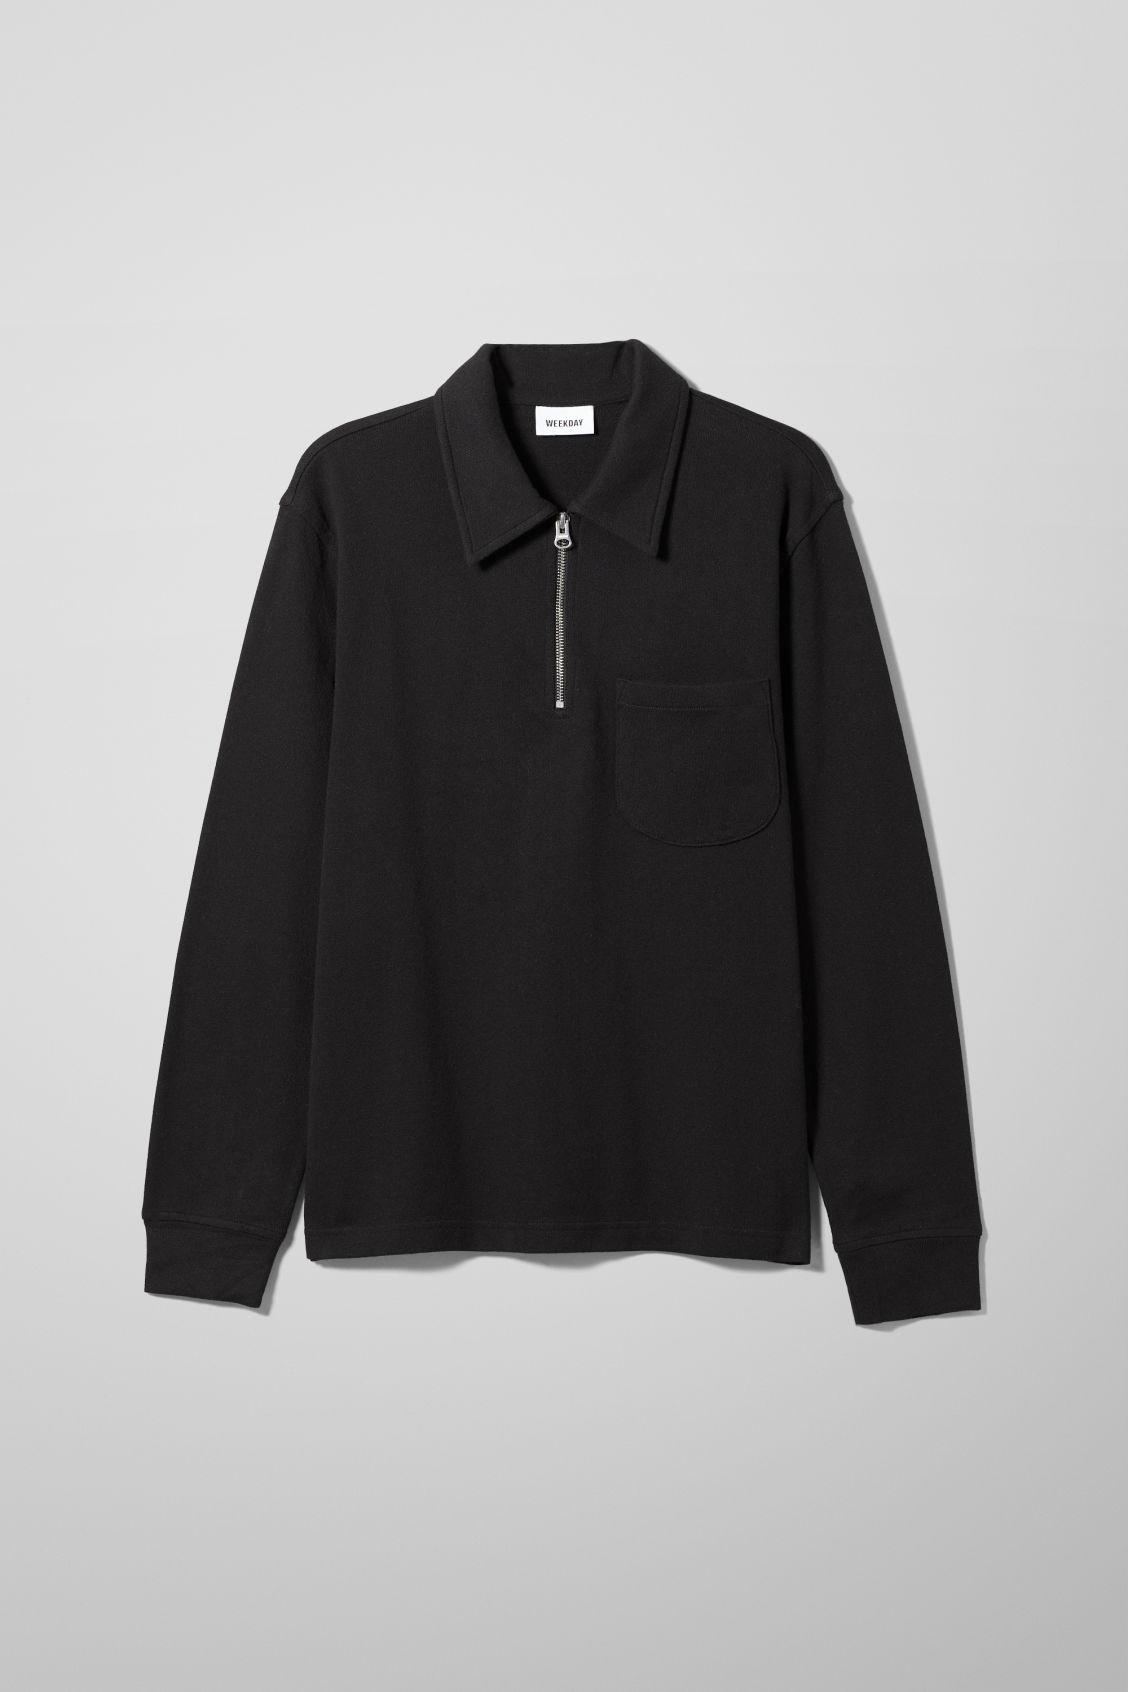 Simon Half Zip Long Sleeve - Black